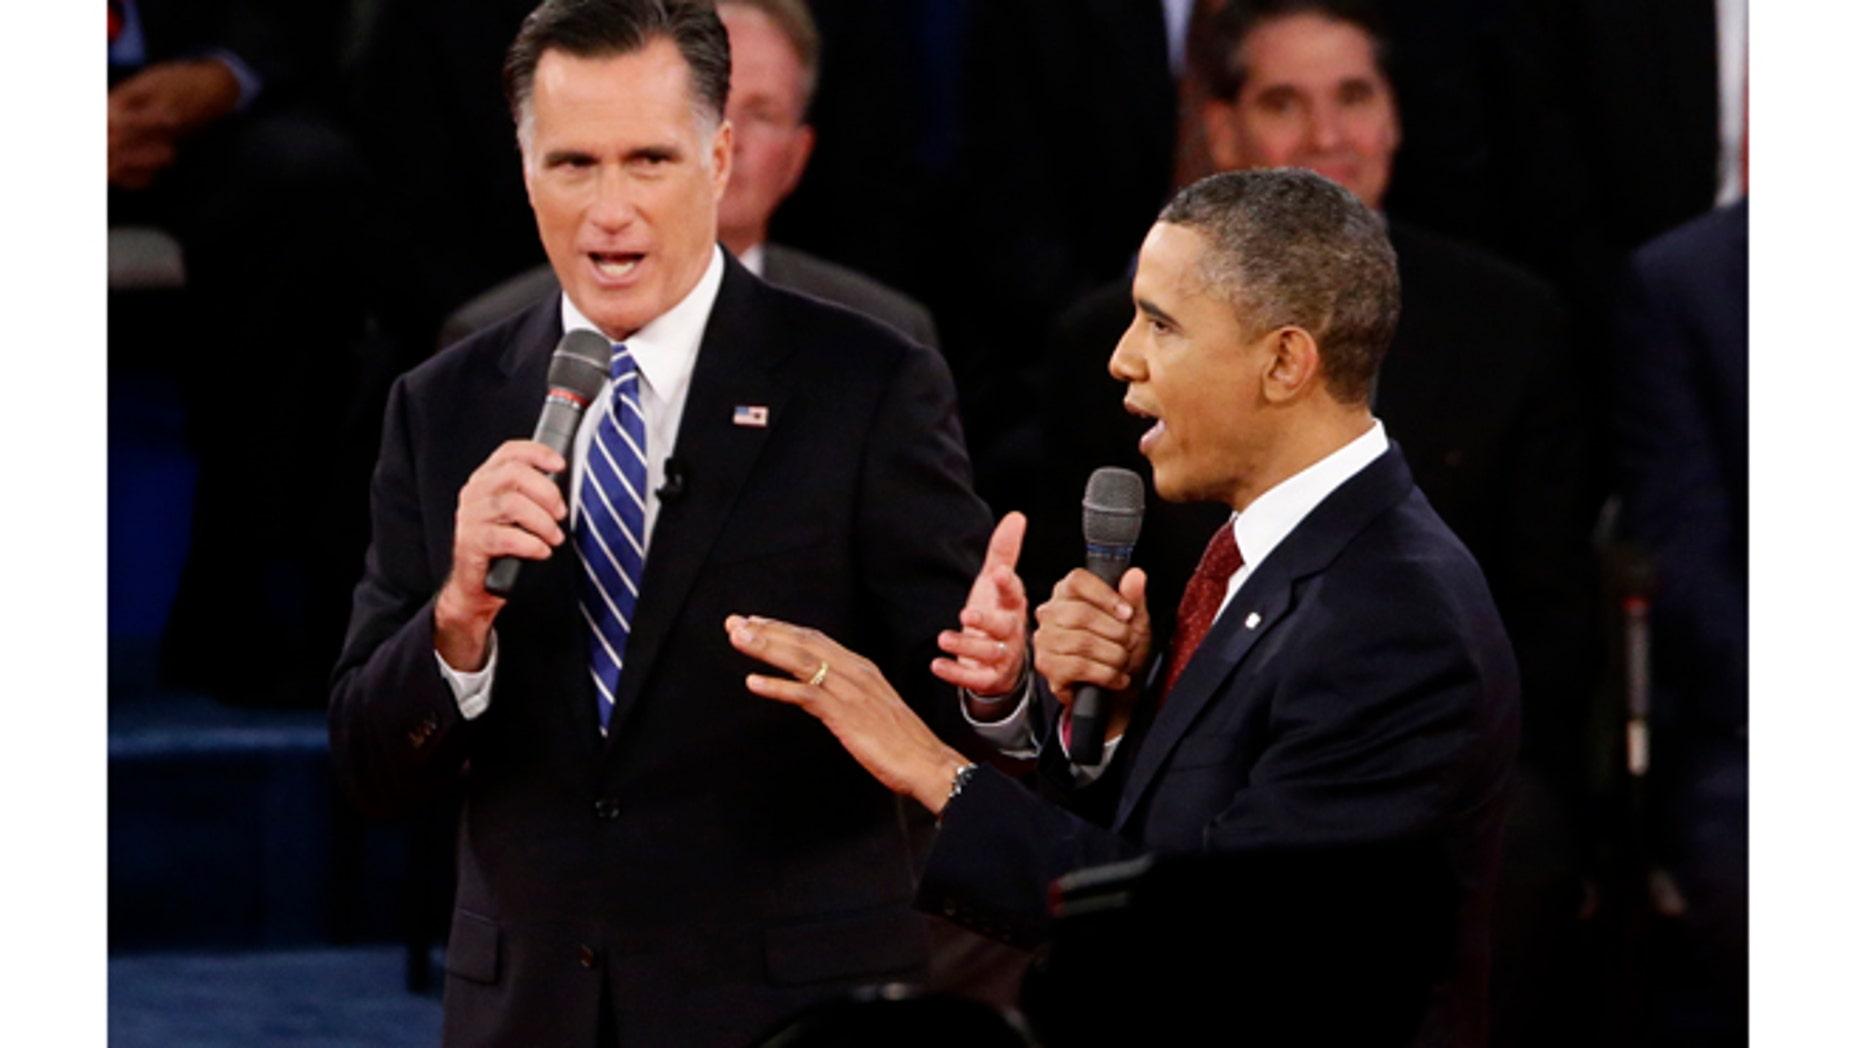 FILE: Oct. 16, 2012: President Barack Obama and Mitt Romney in the second presidential debate, at Hofstra University, in Long Island, N.Y.